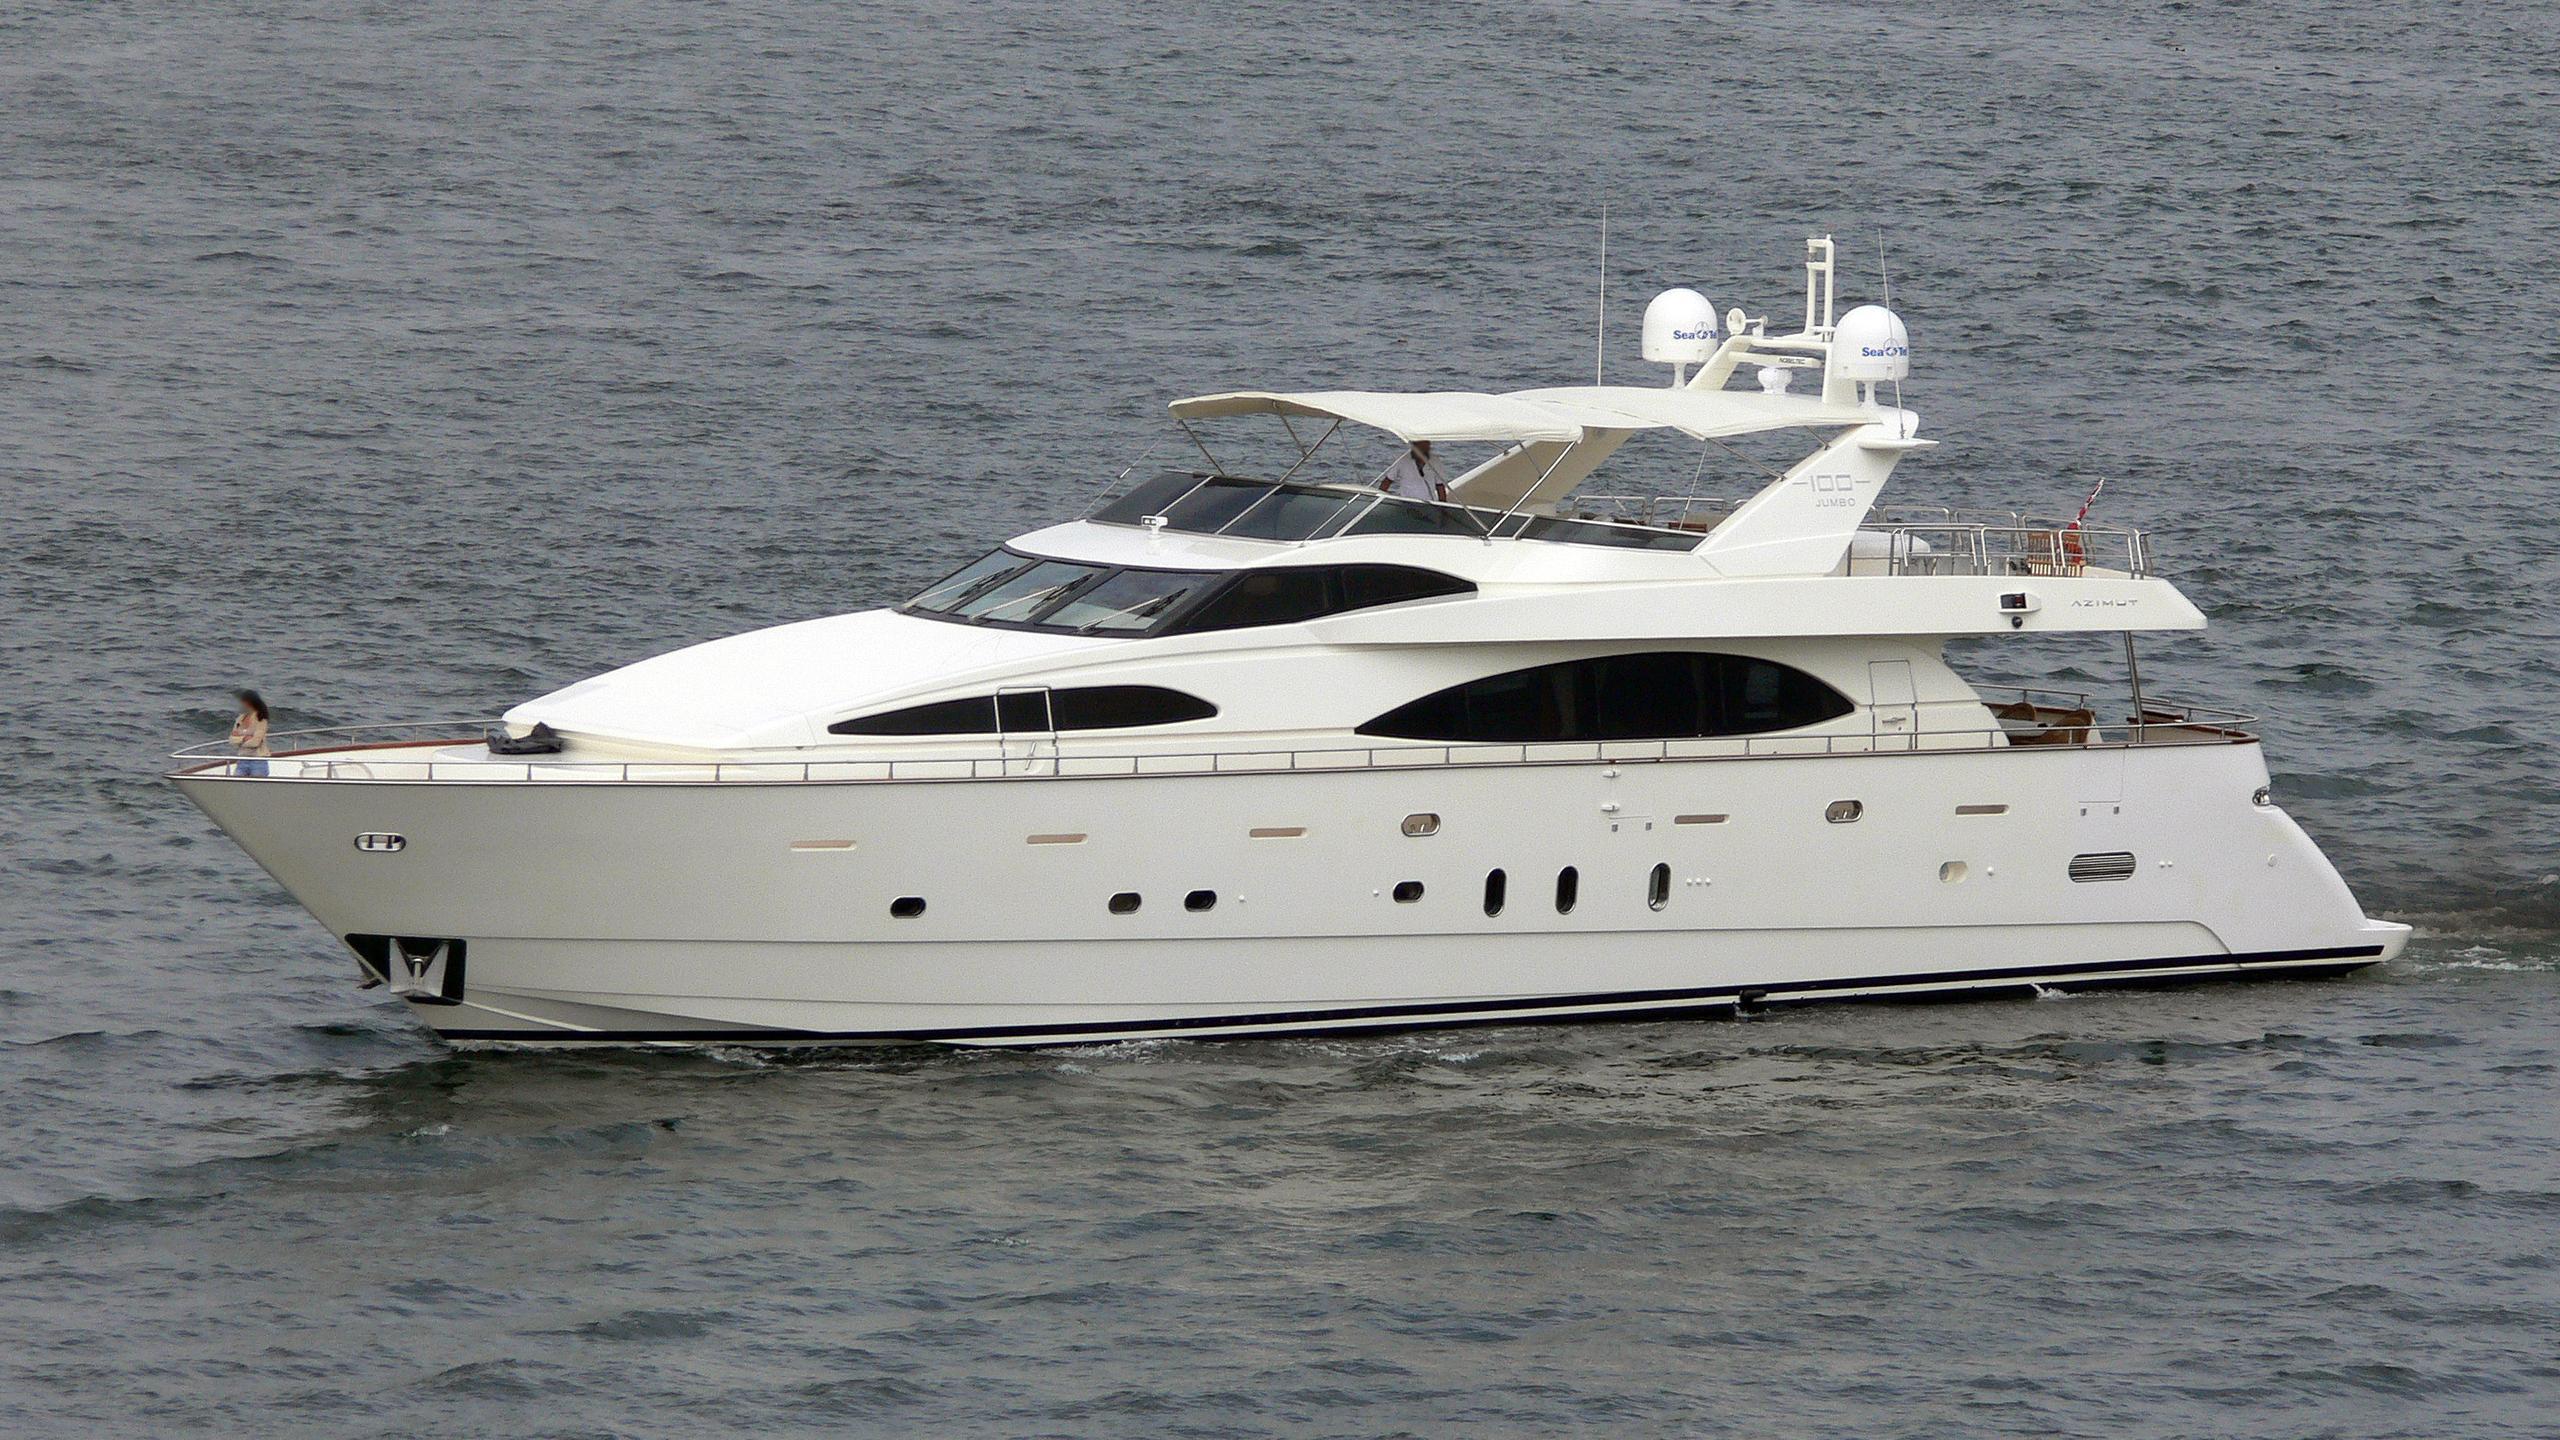 al-to-mar-motor-yacht-azimut-100-jumbo-2004-30m-profile